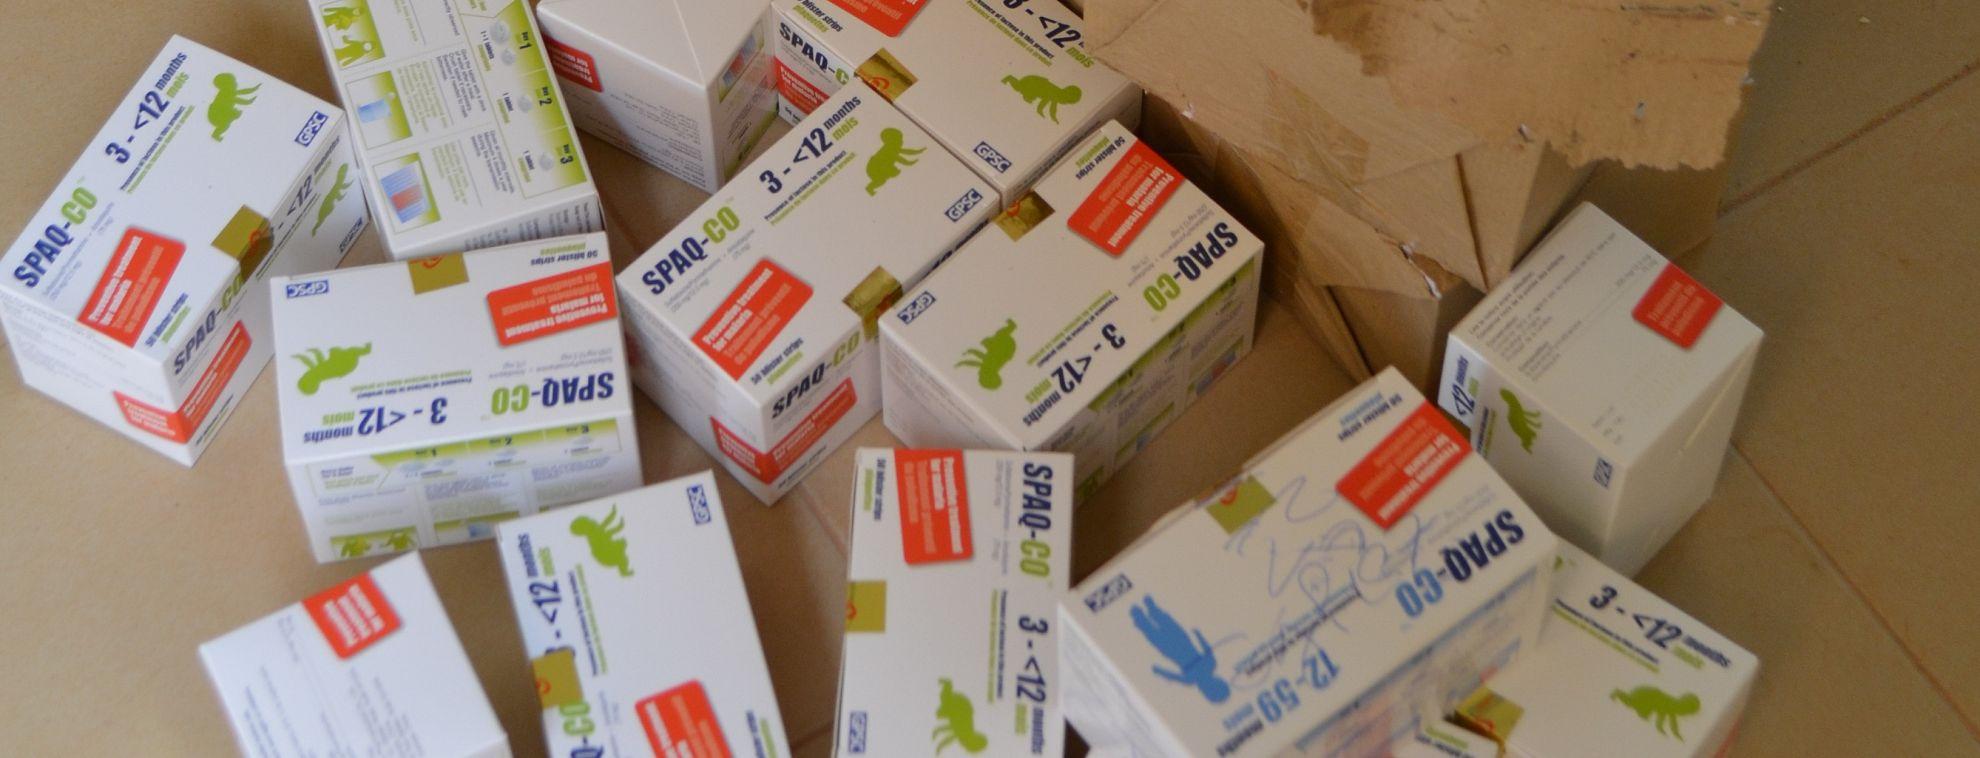 Latest News Malaria consortium trustee professor sir brian greenwood on drug resistance